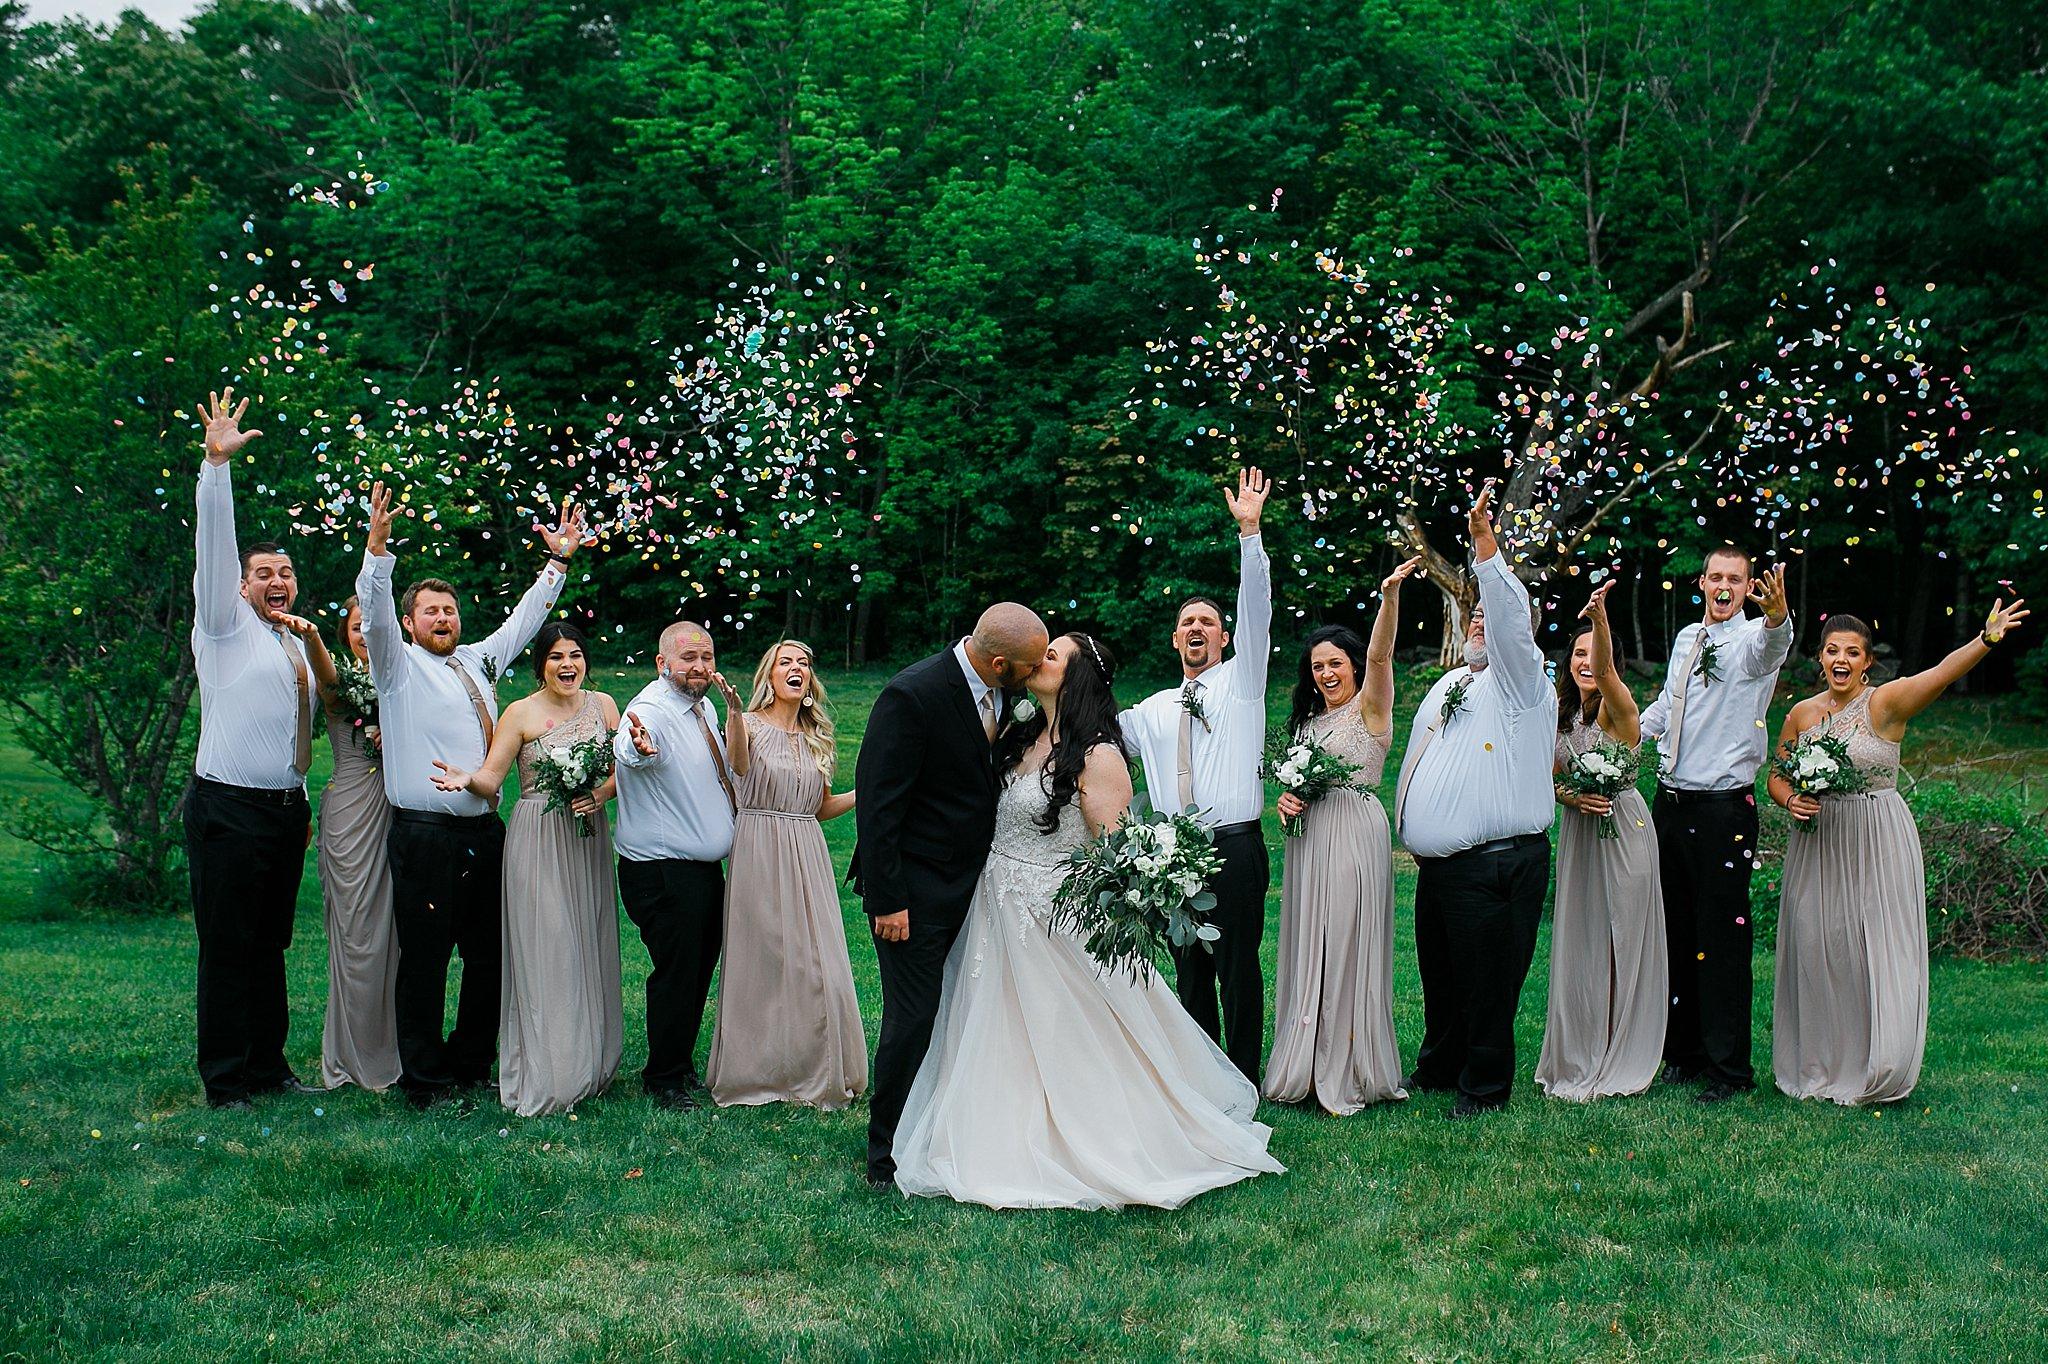 Preserve at Chocorua Tamworth NH Wedding May Wedding New Hampshire Wedding 54.jpg